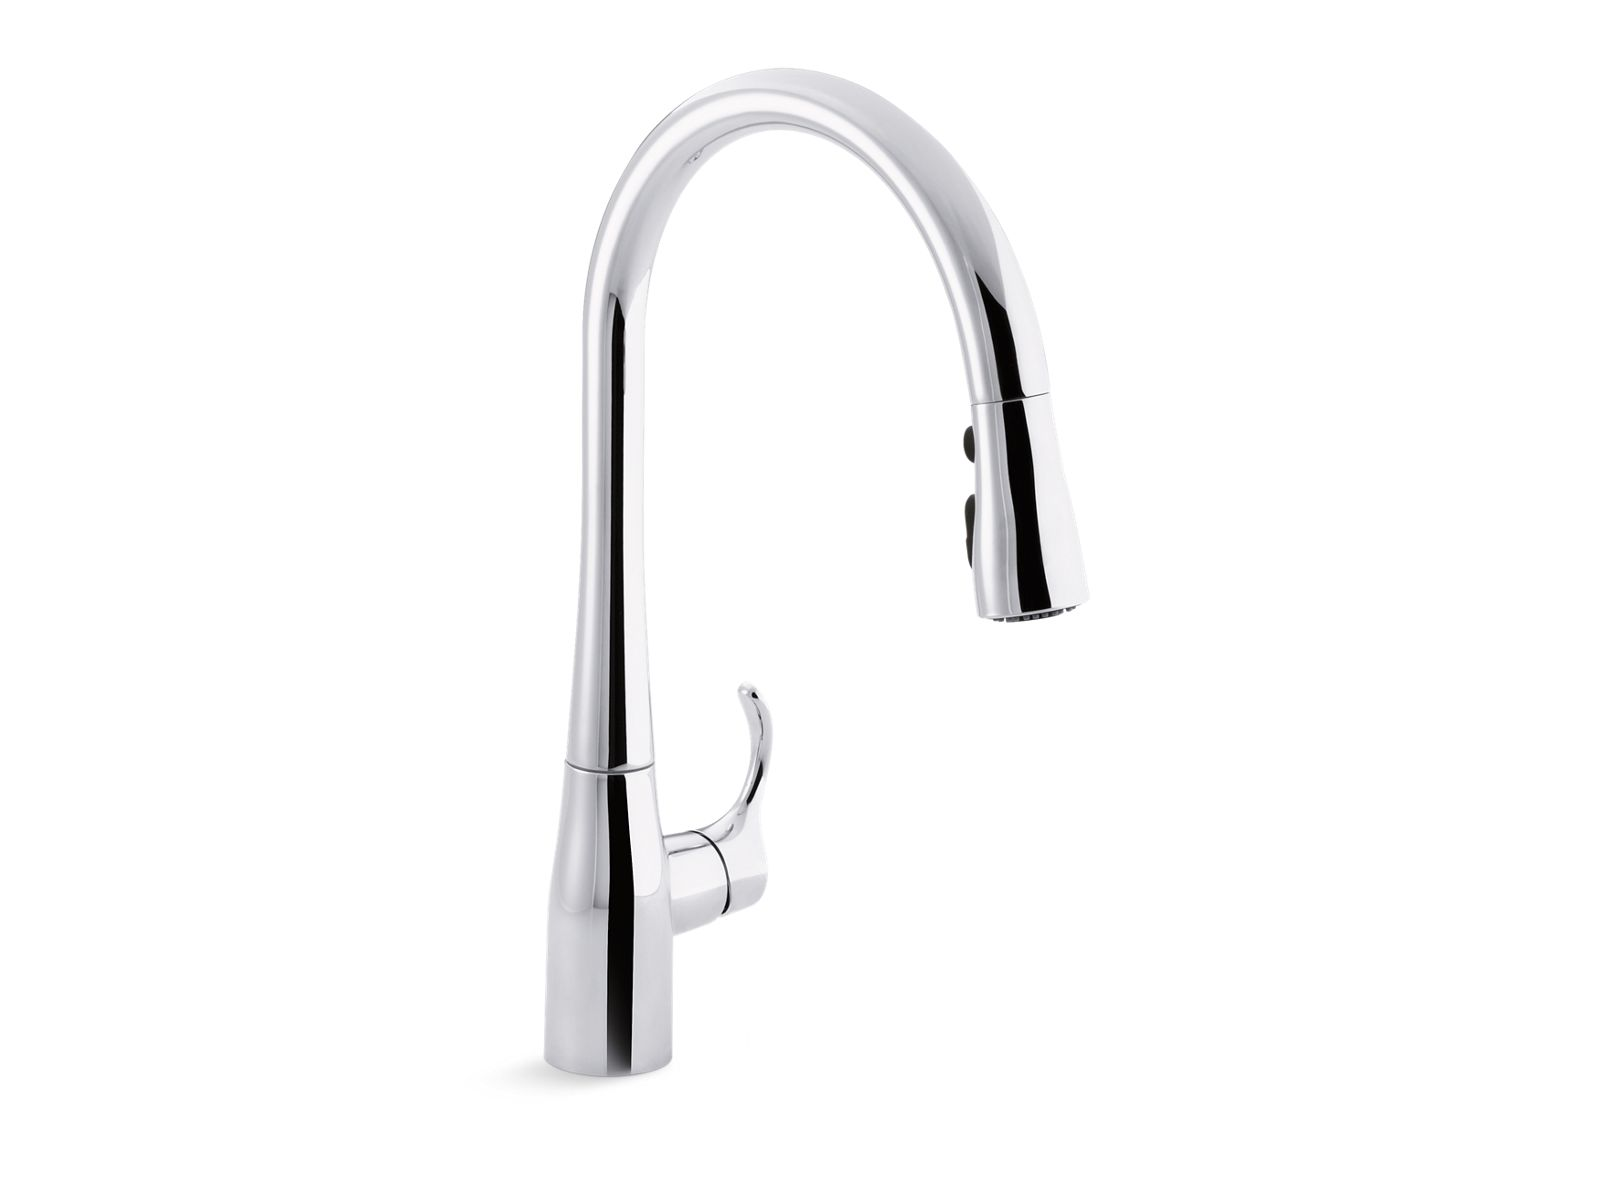 K596 Simplice SingleHandle Kitchen Sink Faucet KOHLER